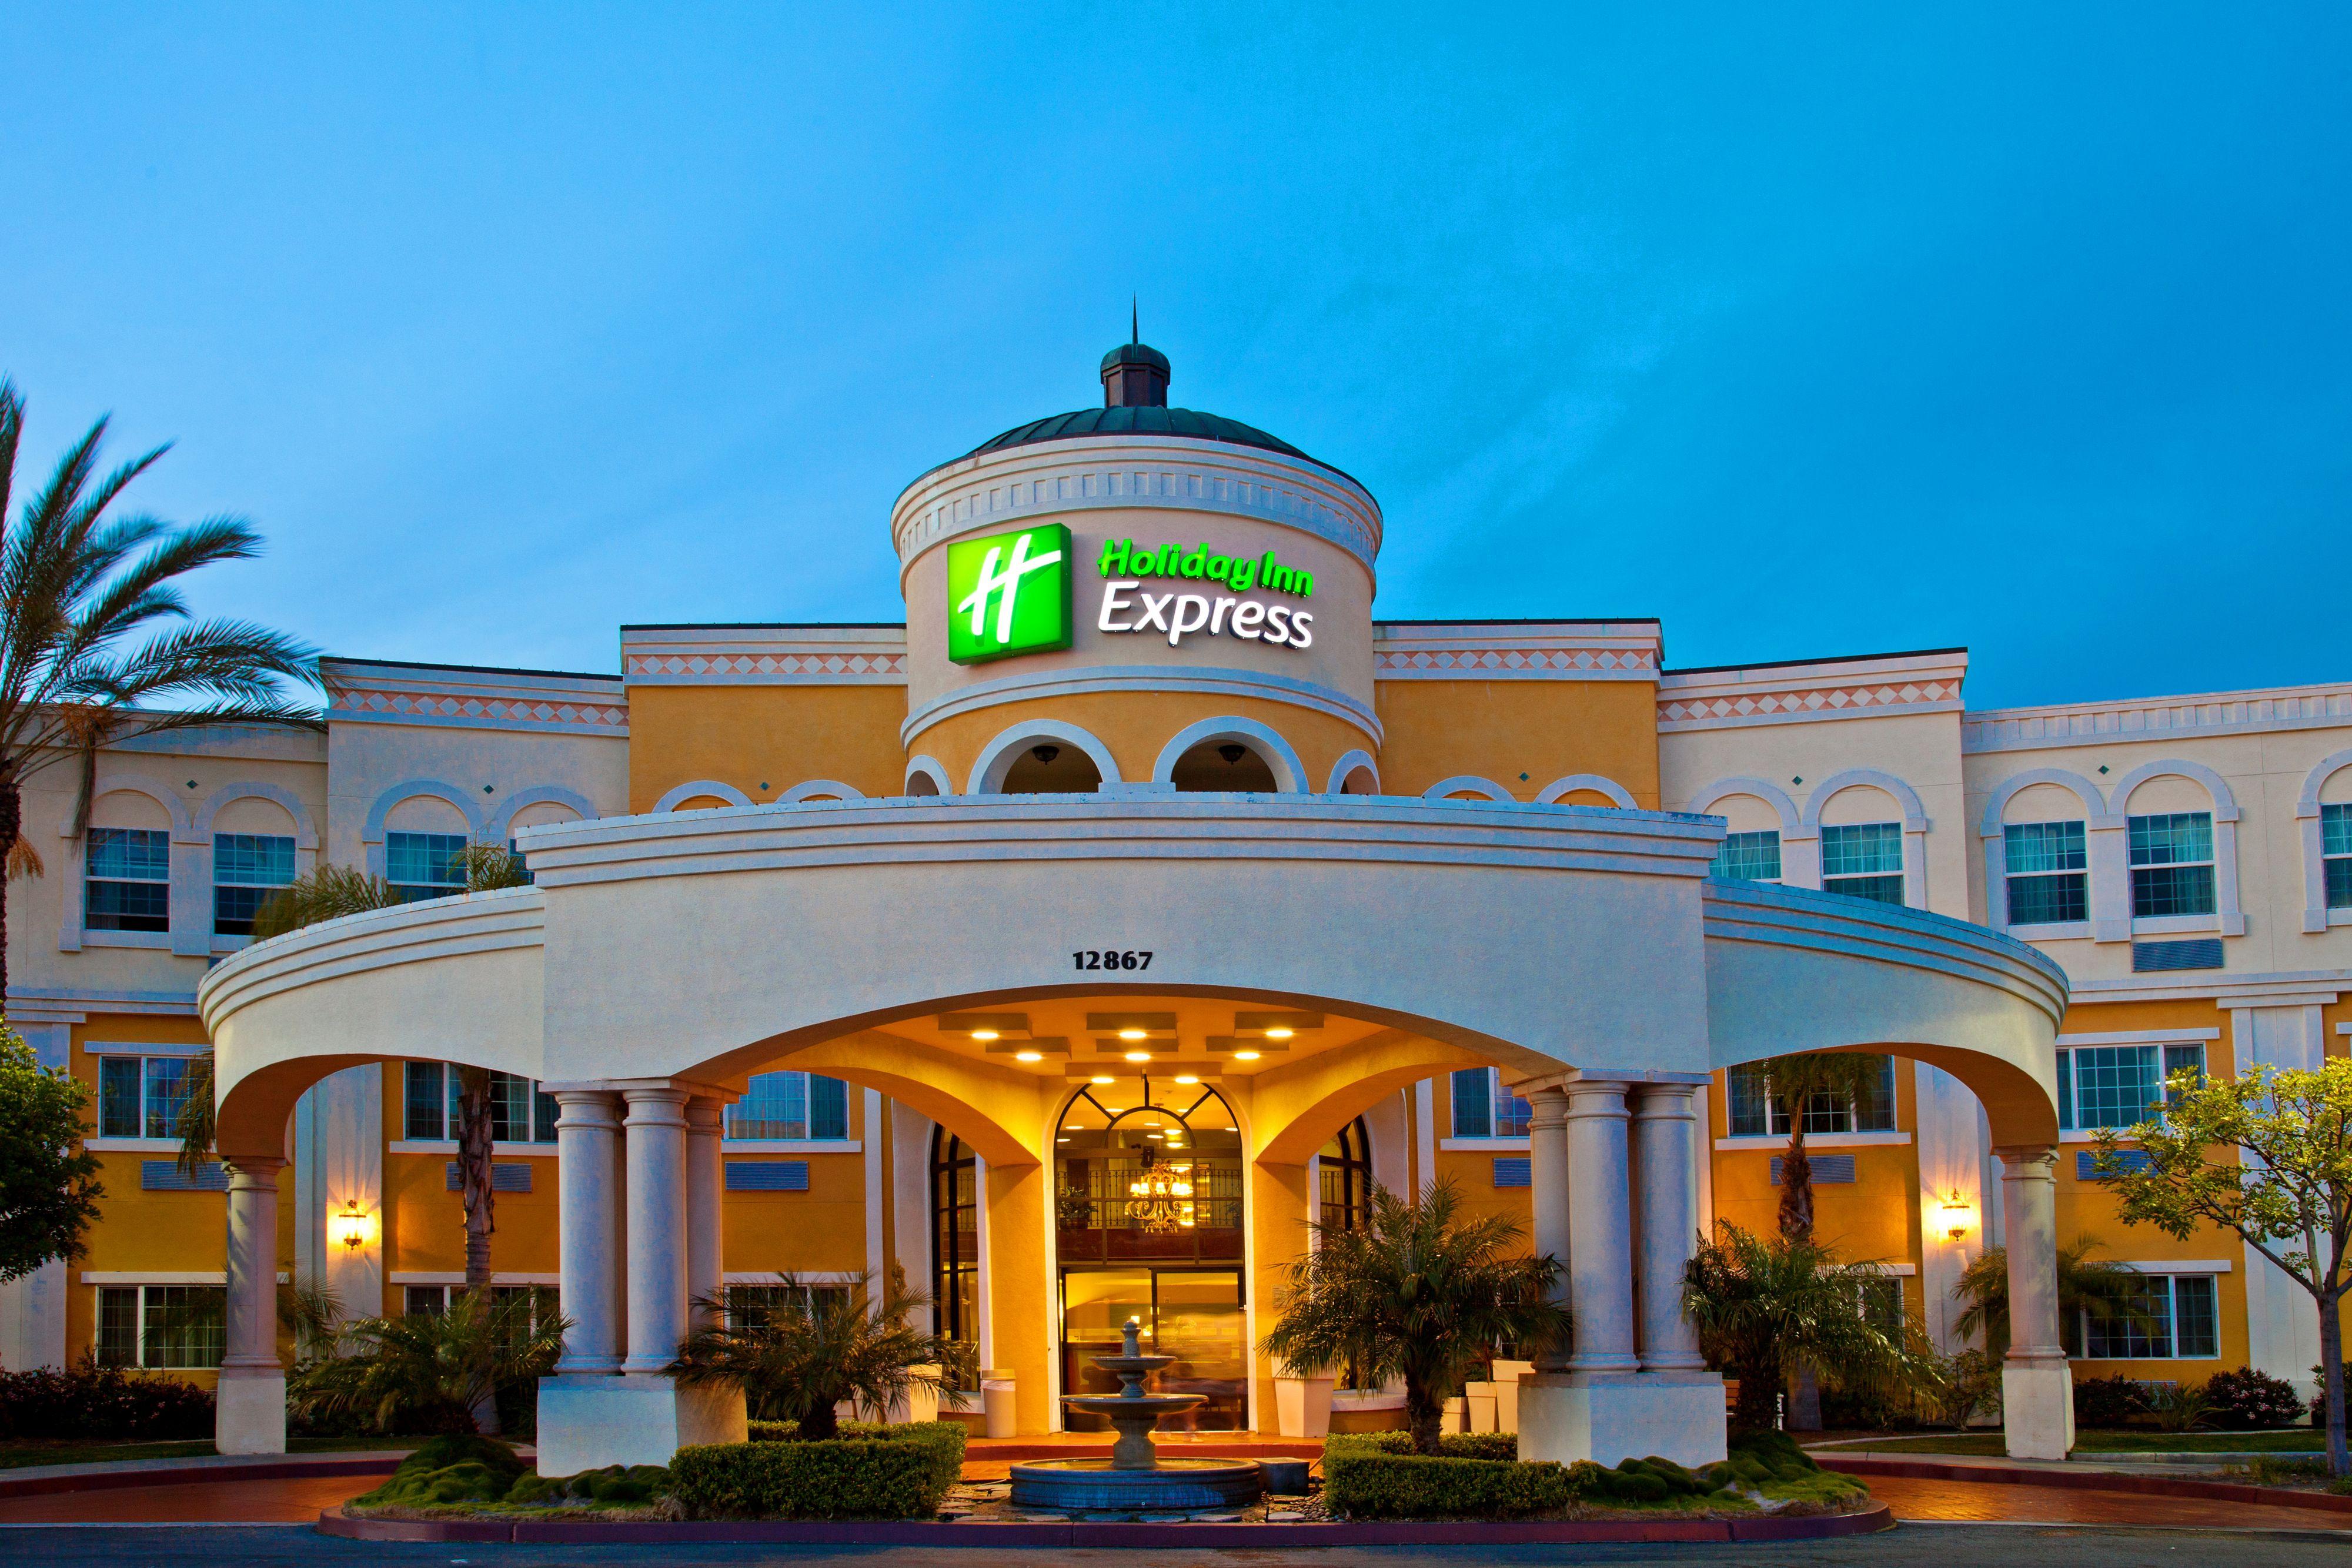 Holiday Inn Express Amp Suites Galveston West Seawall